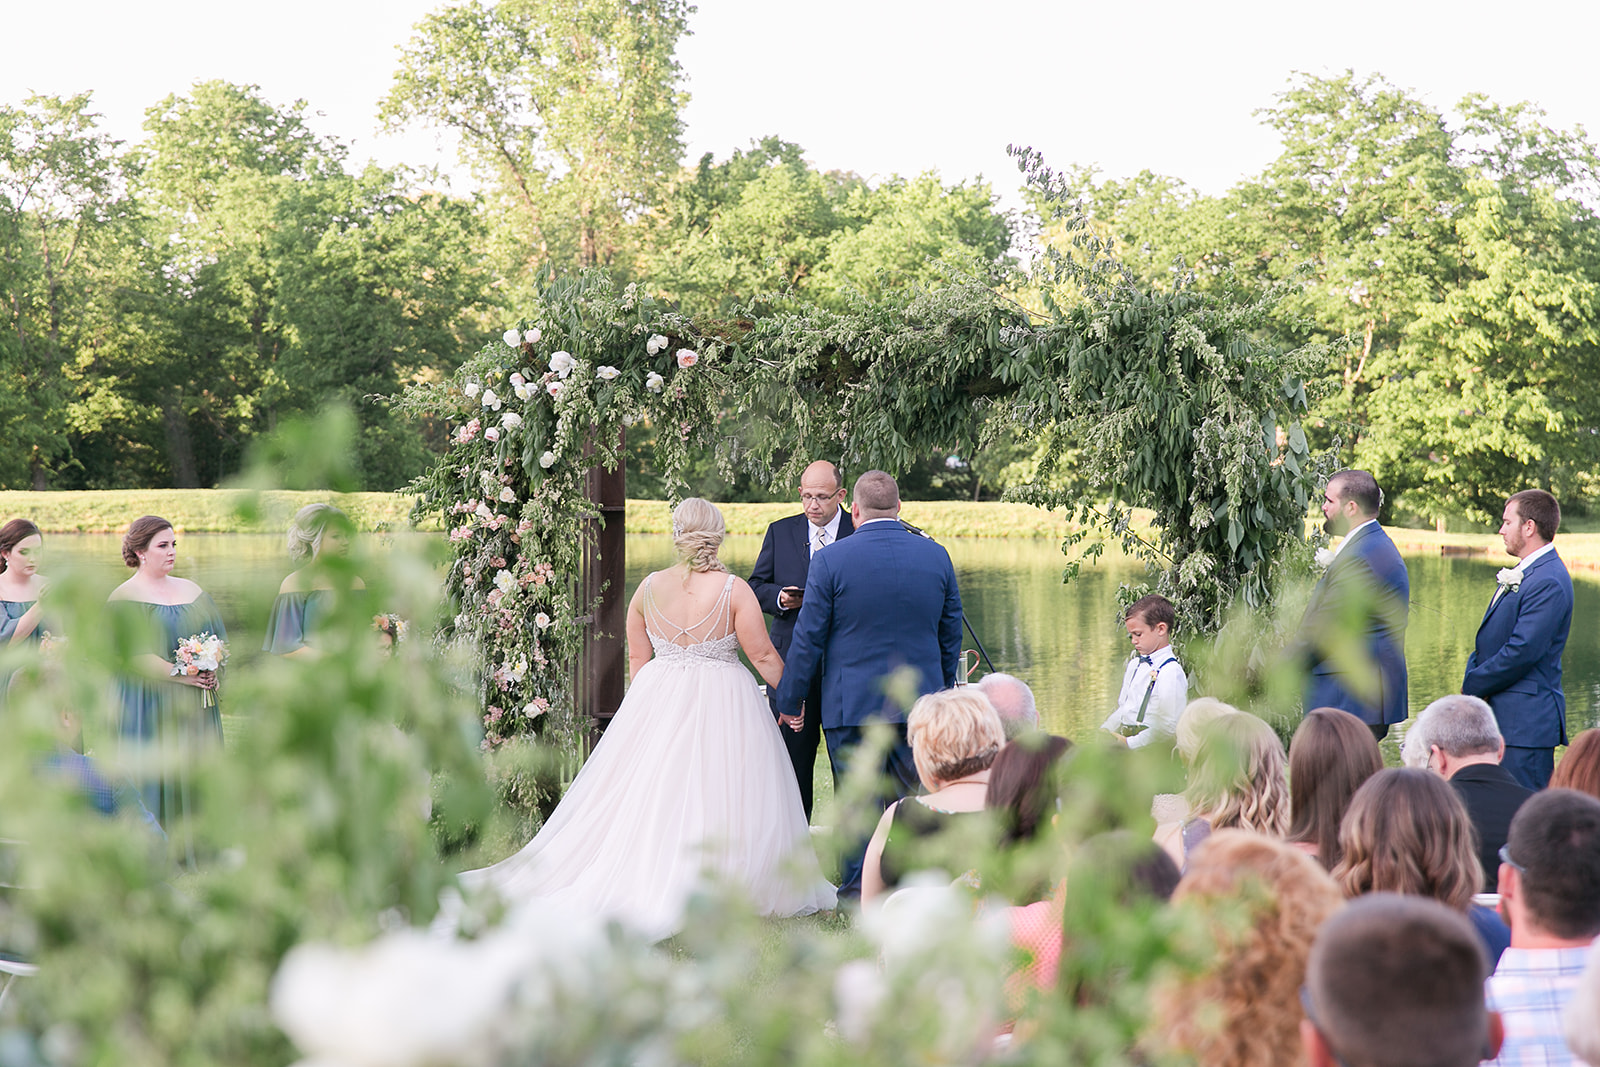 Abbey-Colby-wedding-82_websize.jpg